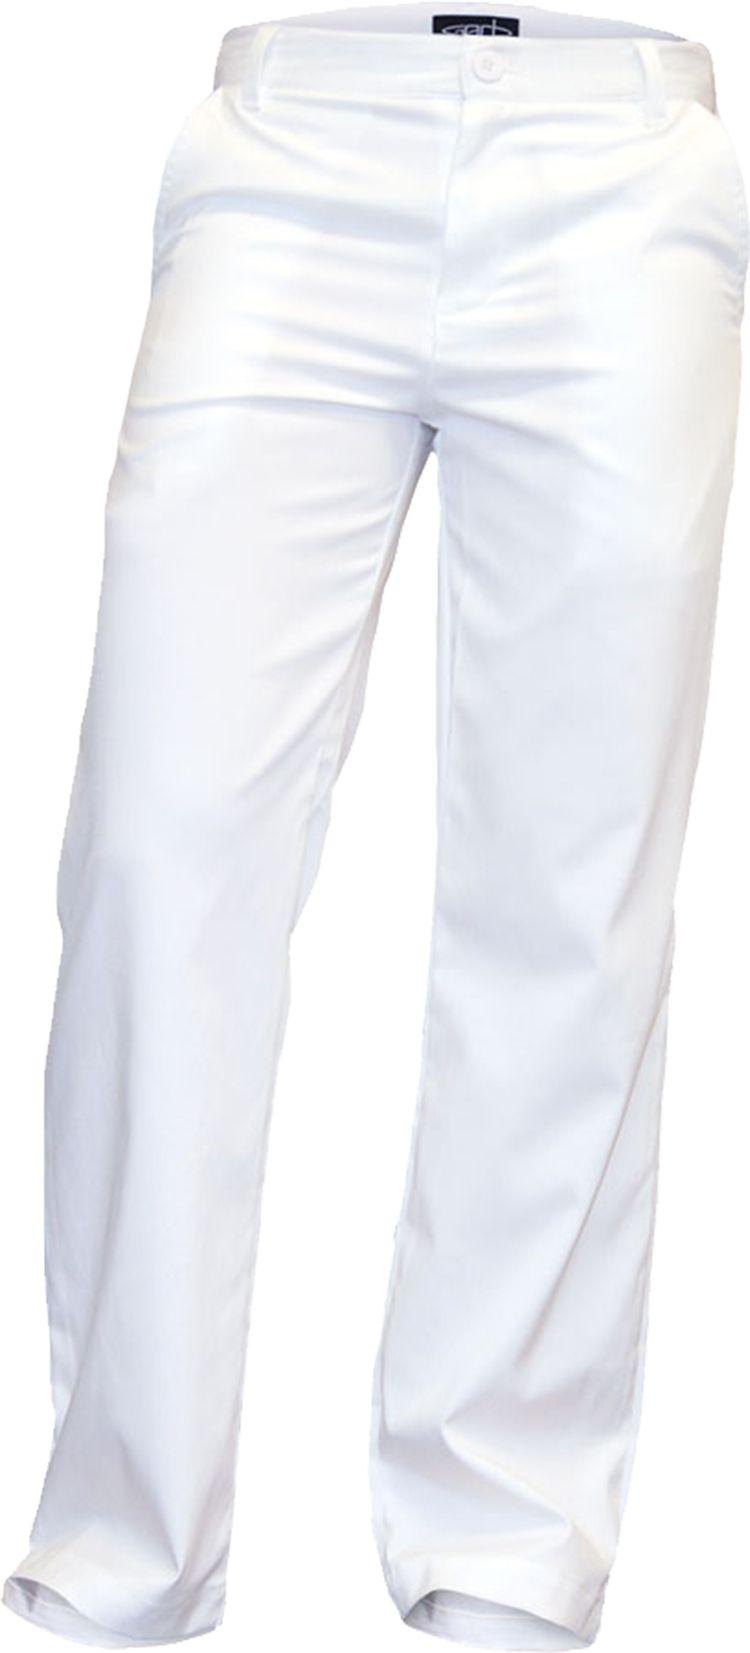 Garb Boys' Bubba Tech Golf Pants, Medium, White